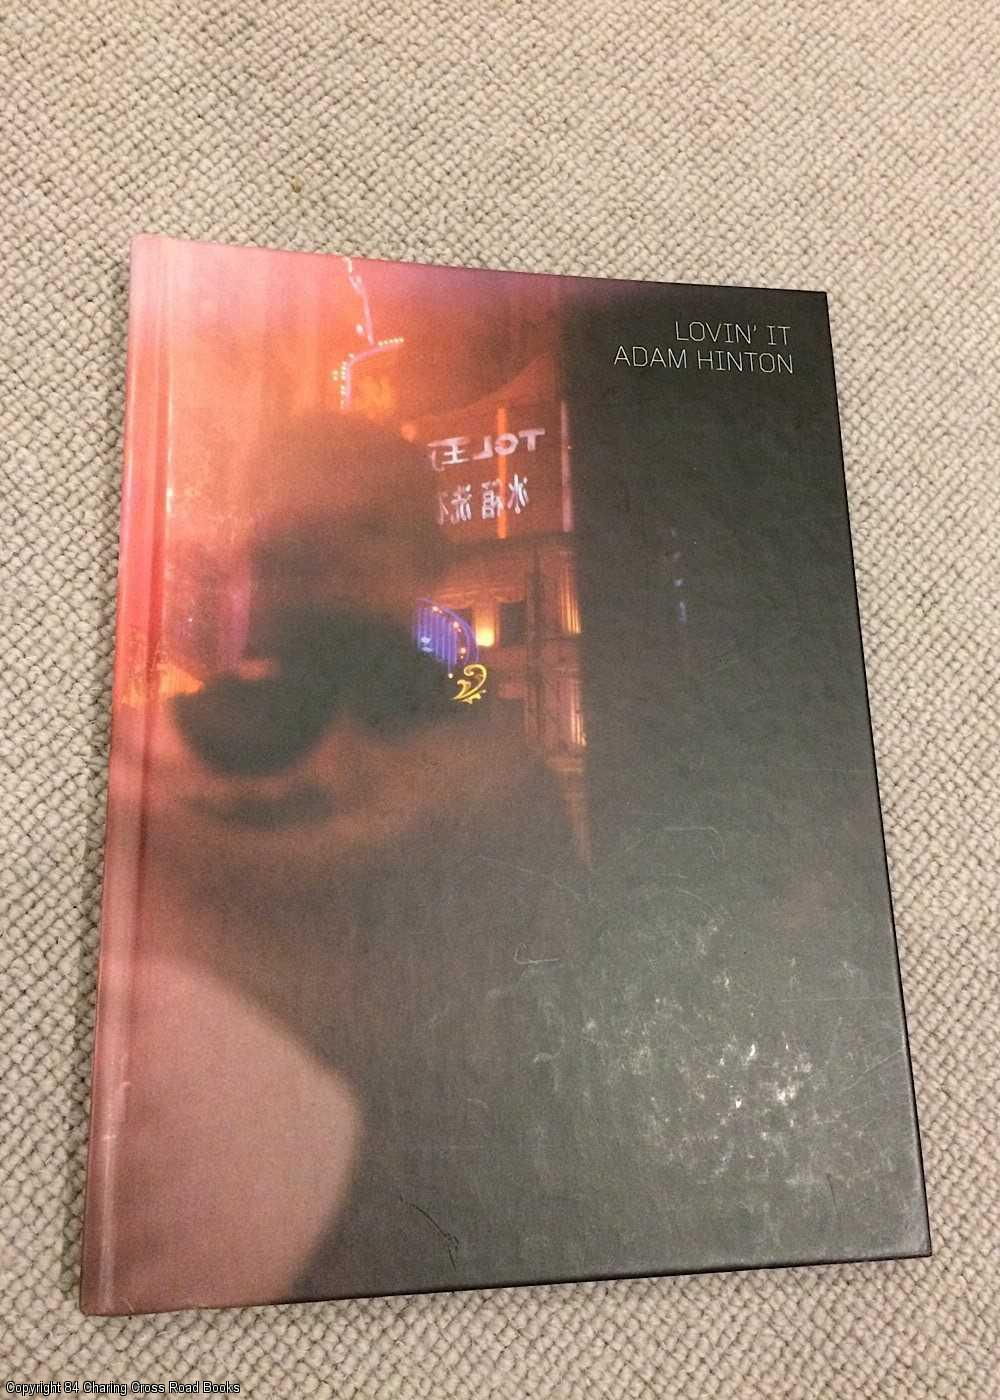 GITTINGS, JOHN, WARBURTON, NIGEL, HINTON, ADAM - Lovin' It: Photographs from Shanghai